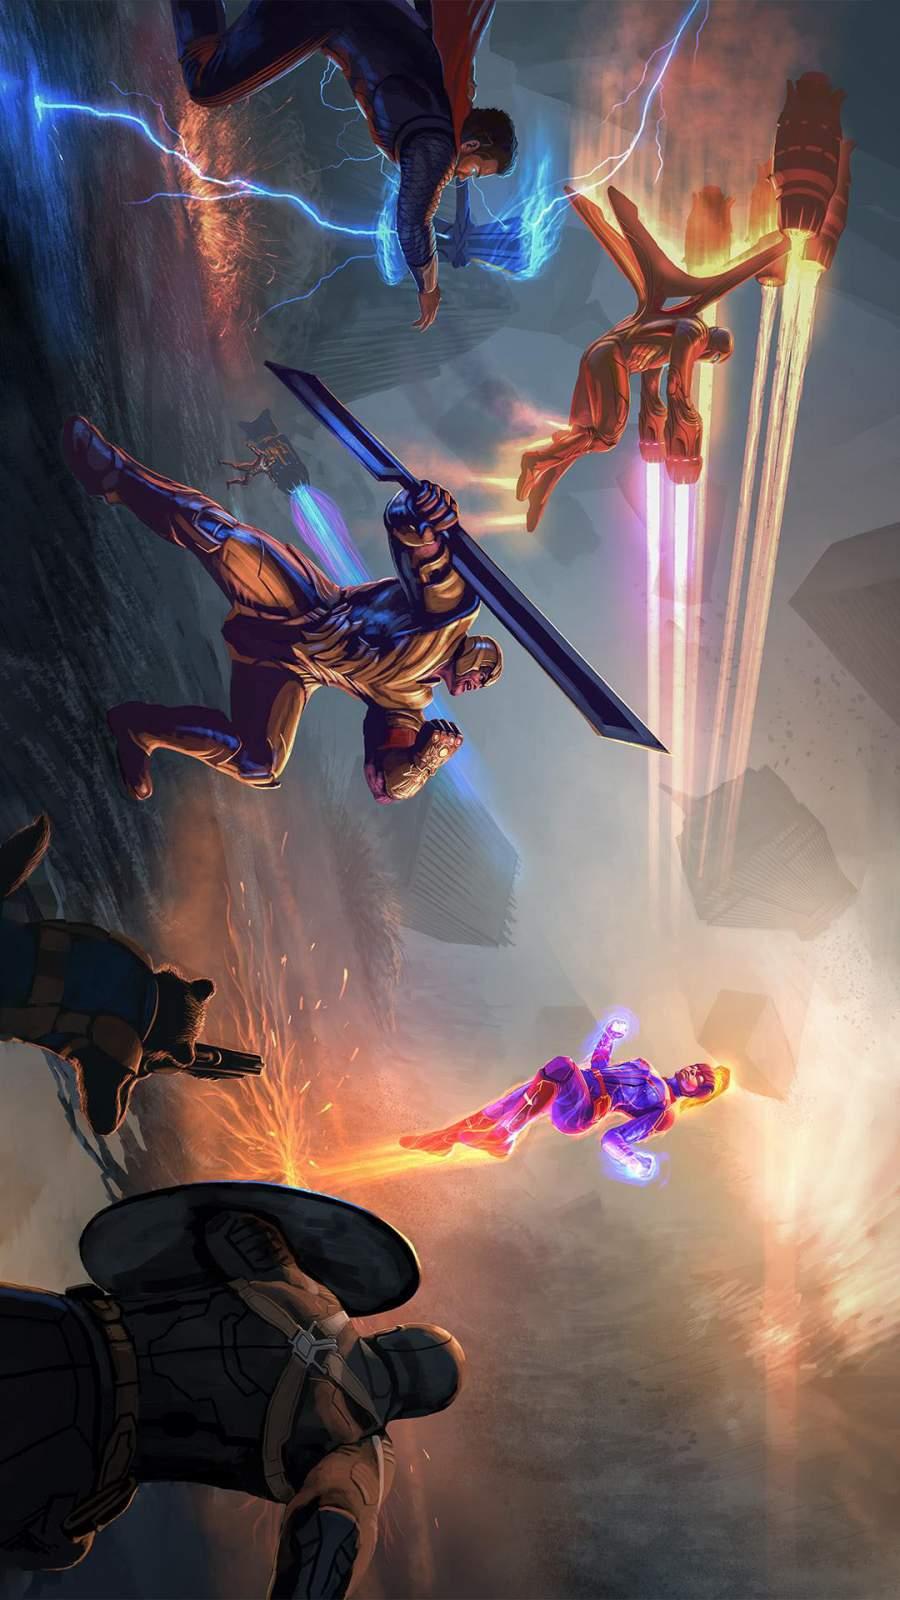 Thanos and Avengers vs Captai Marvel iPhone Wallpaper